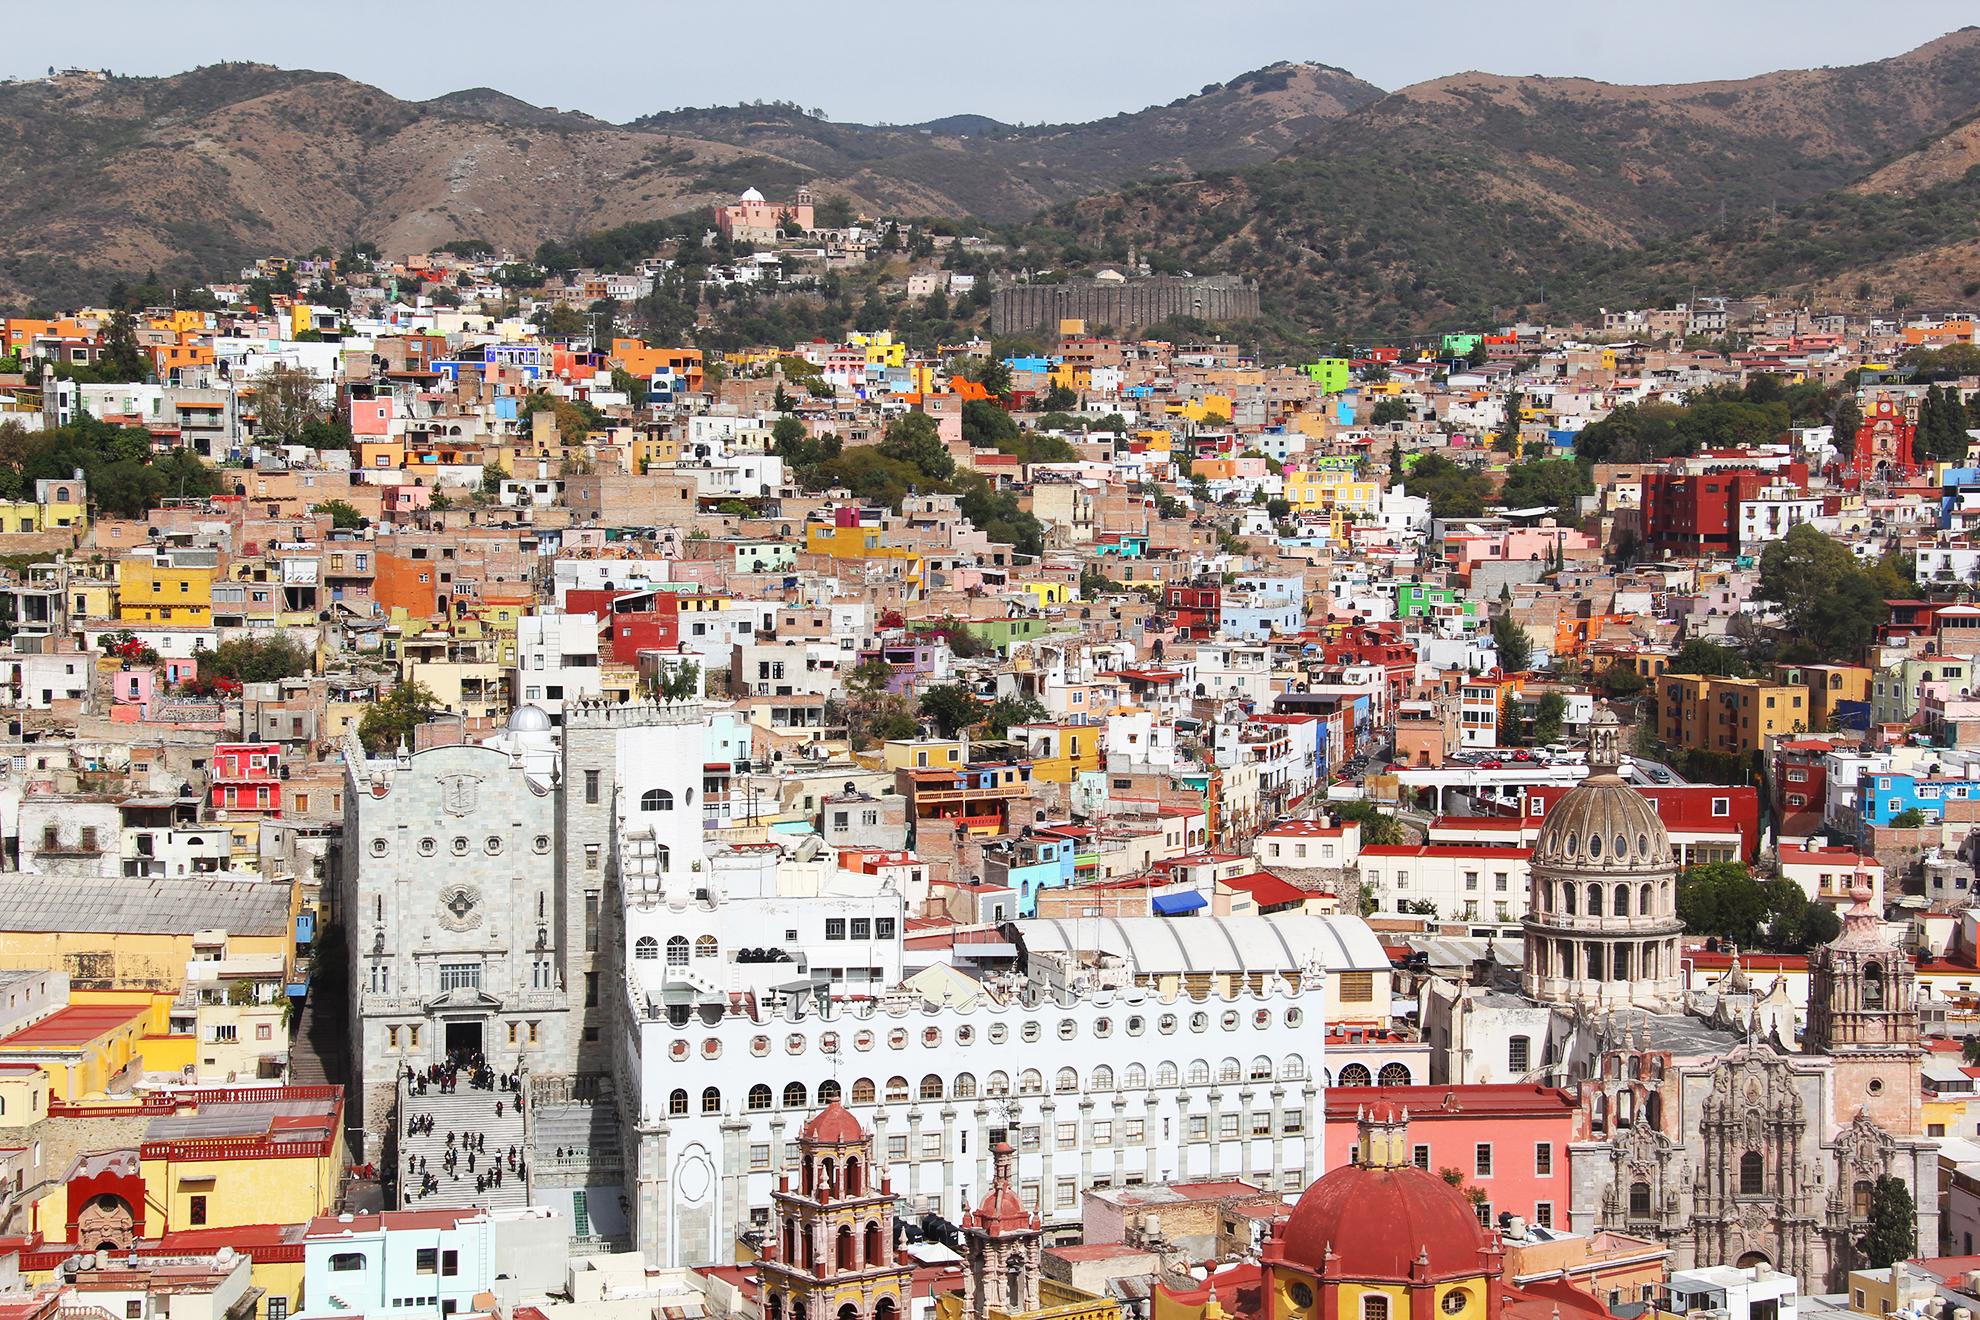 Vista panorámica de Guanajuato.